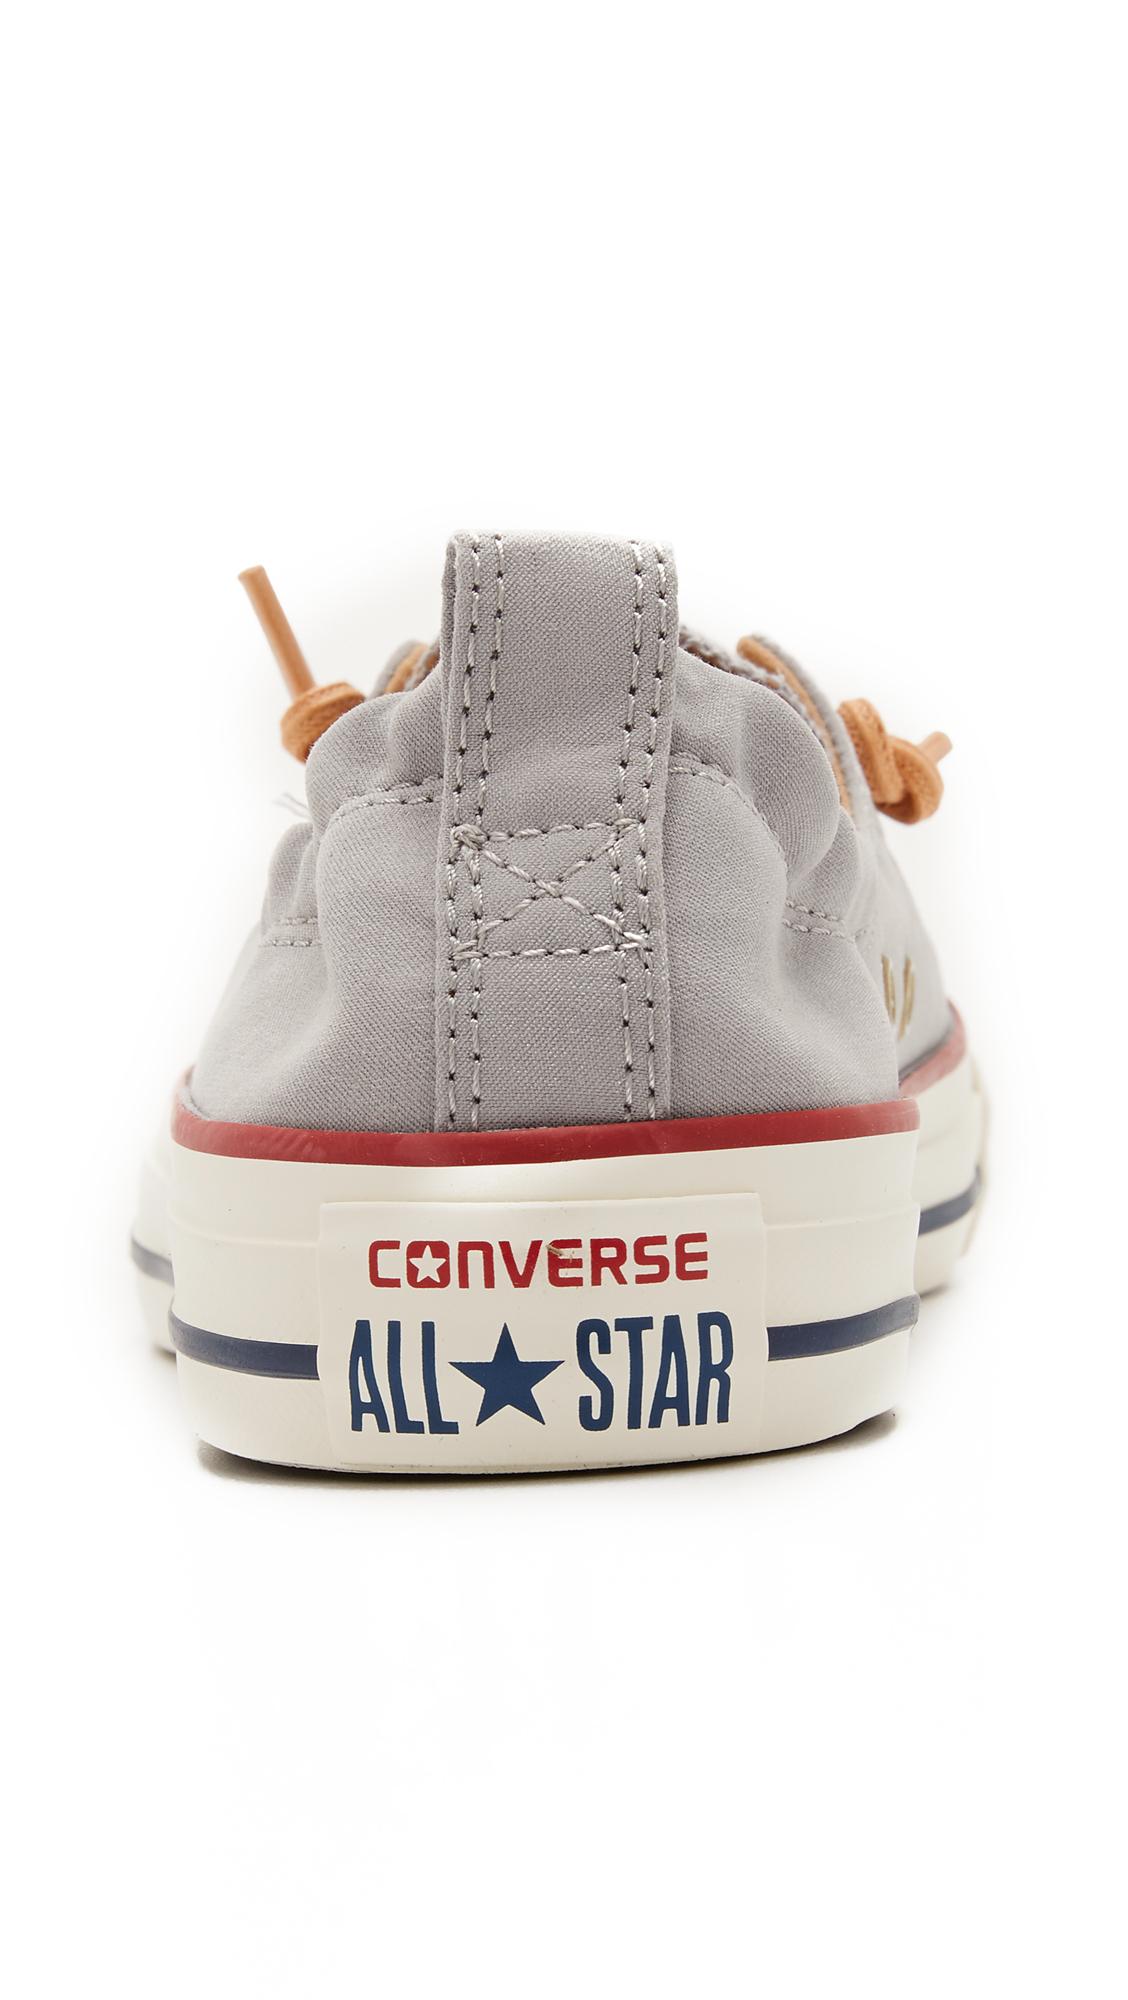 Converse Chuck Taylor All Star Shoreline Sneakers in Grey